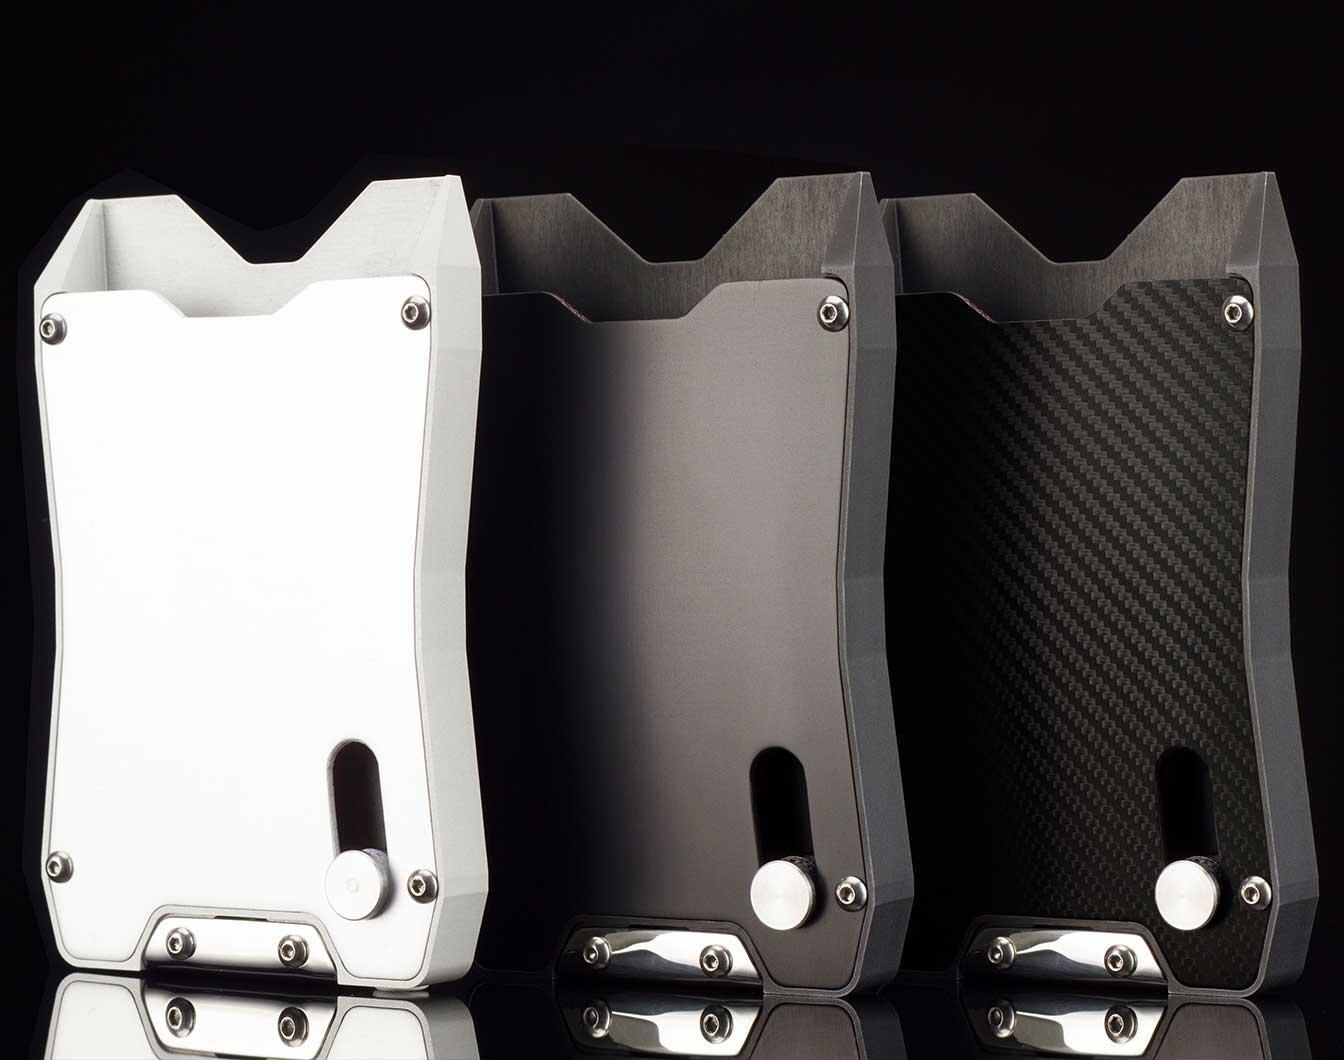 Stealth 2.0 RFID-Blocking Card Holder